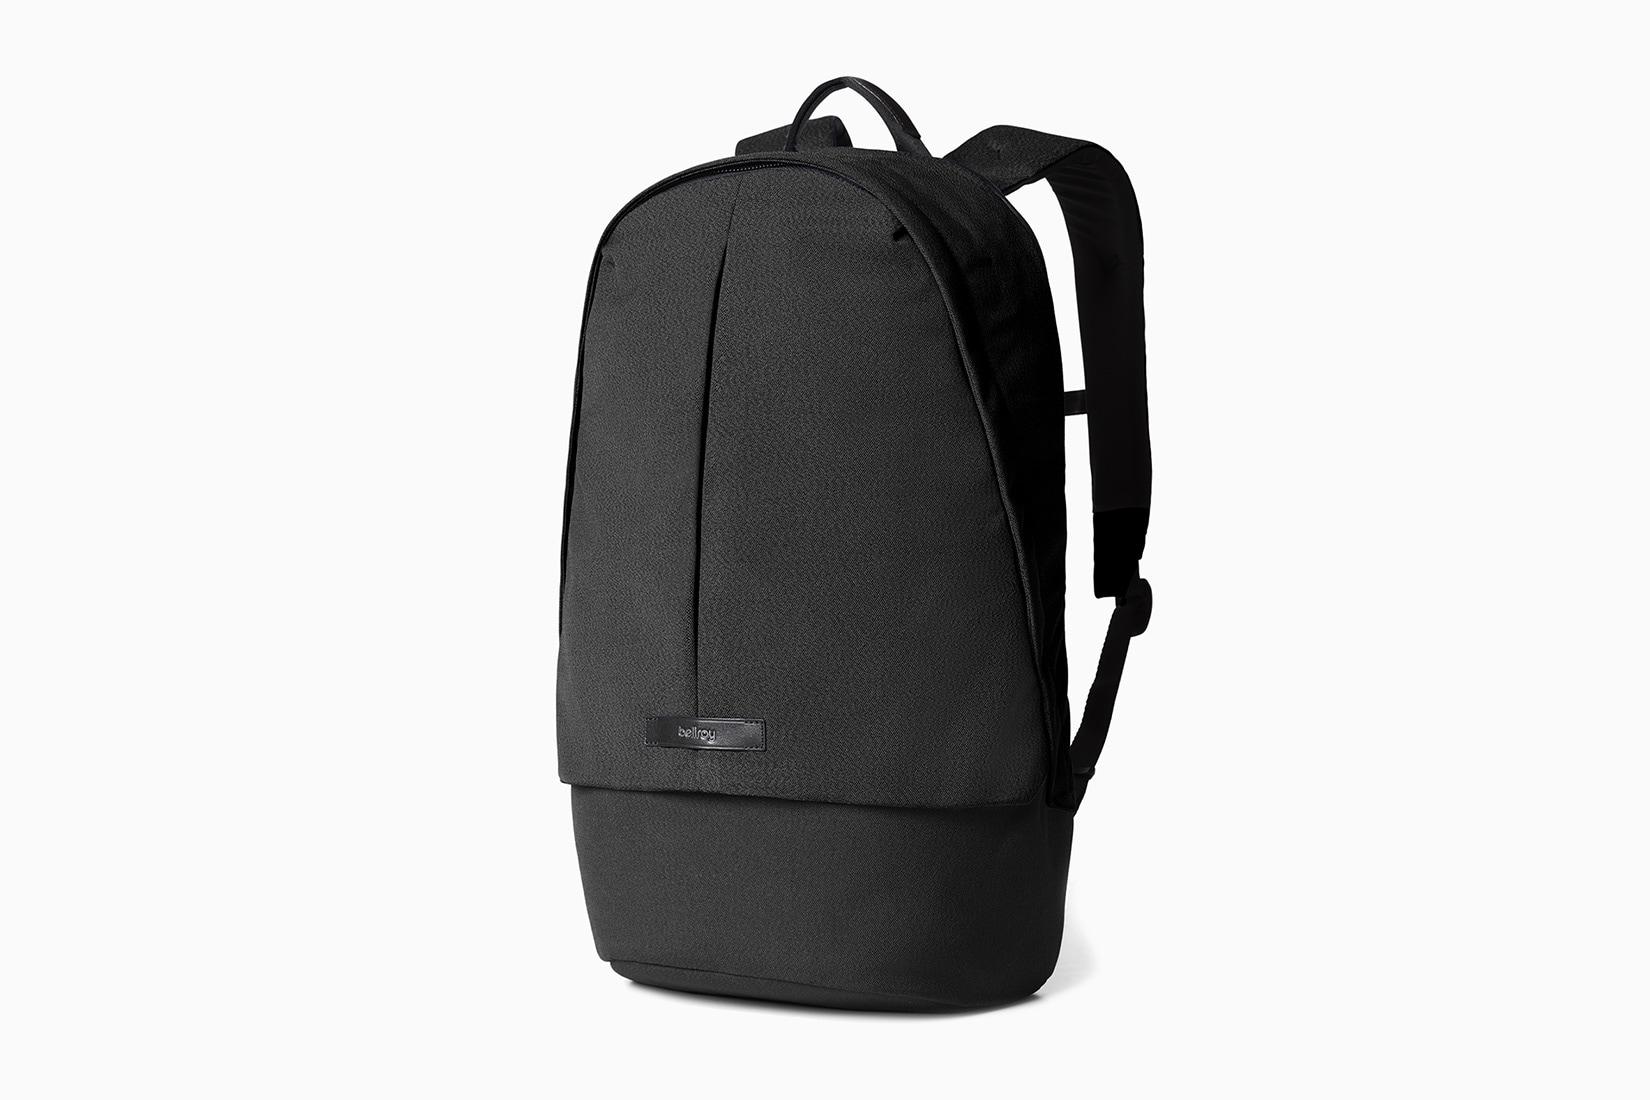 best edc backpack bellroy - Luxe Digital